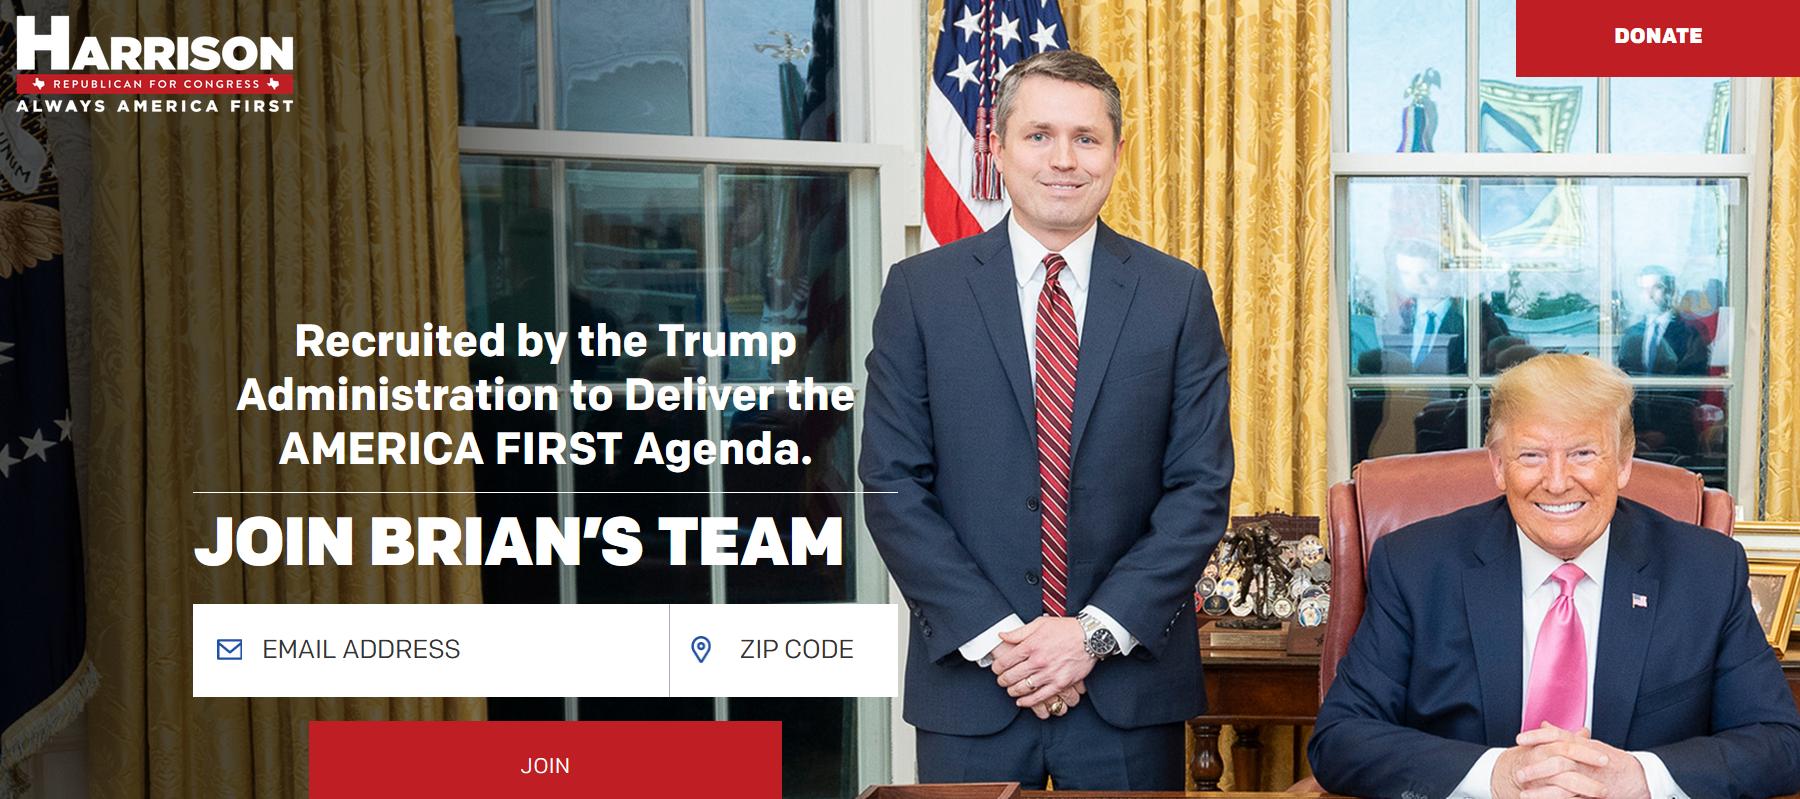 Ex-Trump administration HHS official Brian Harrison announces run for Texas House seat - fox